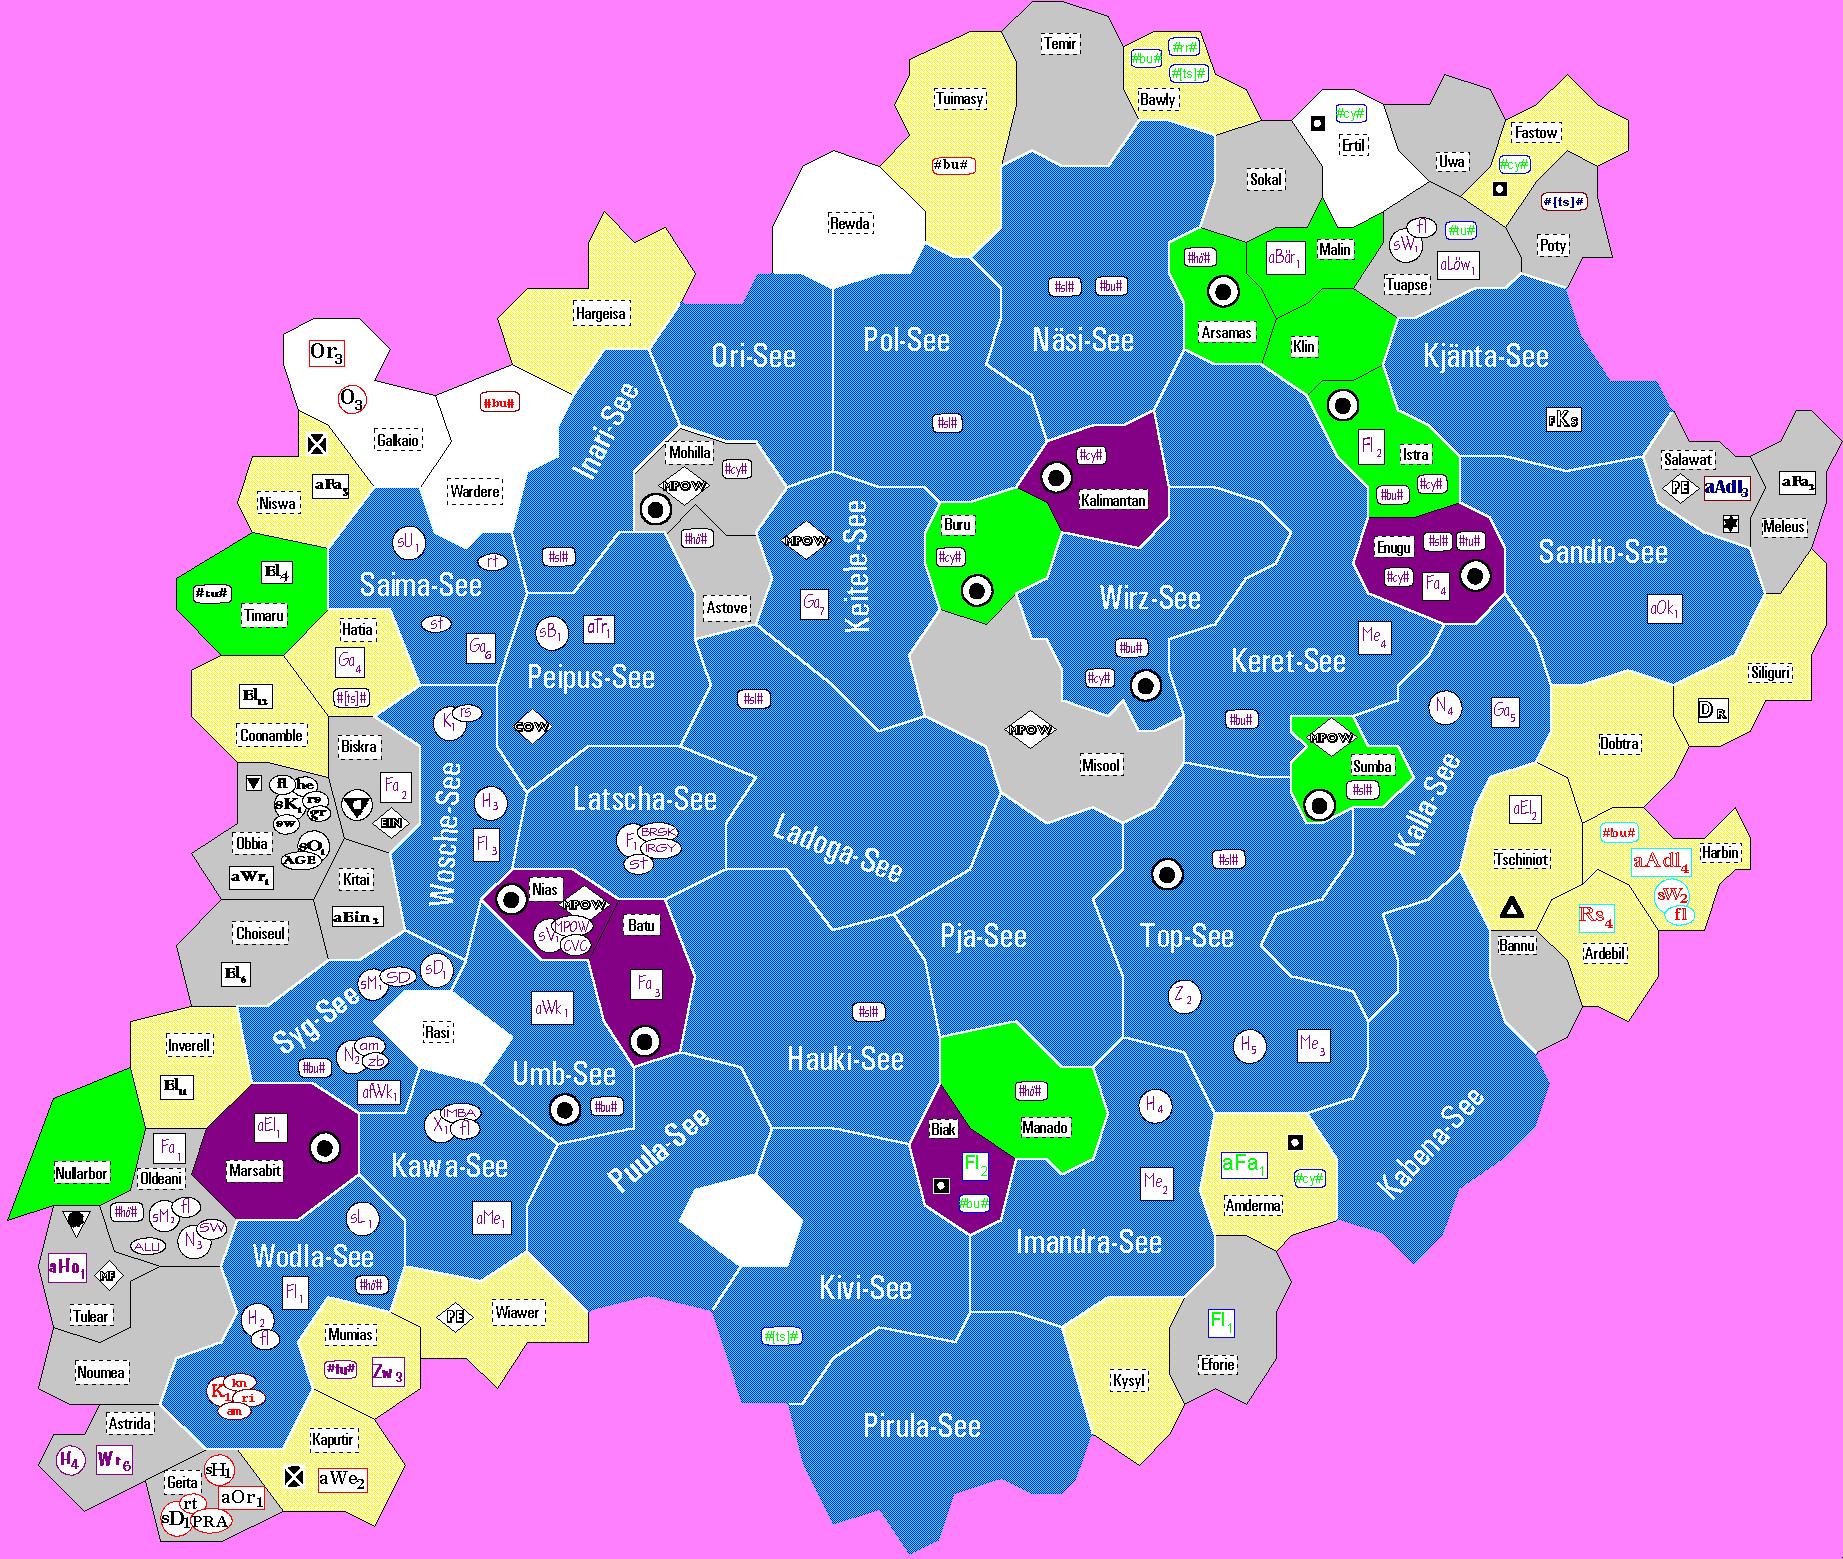 atlantis karte Thorus / Auswertungen: Nacht 08 / Karte Atlantis (groß)